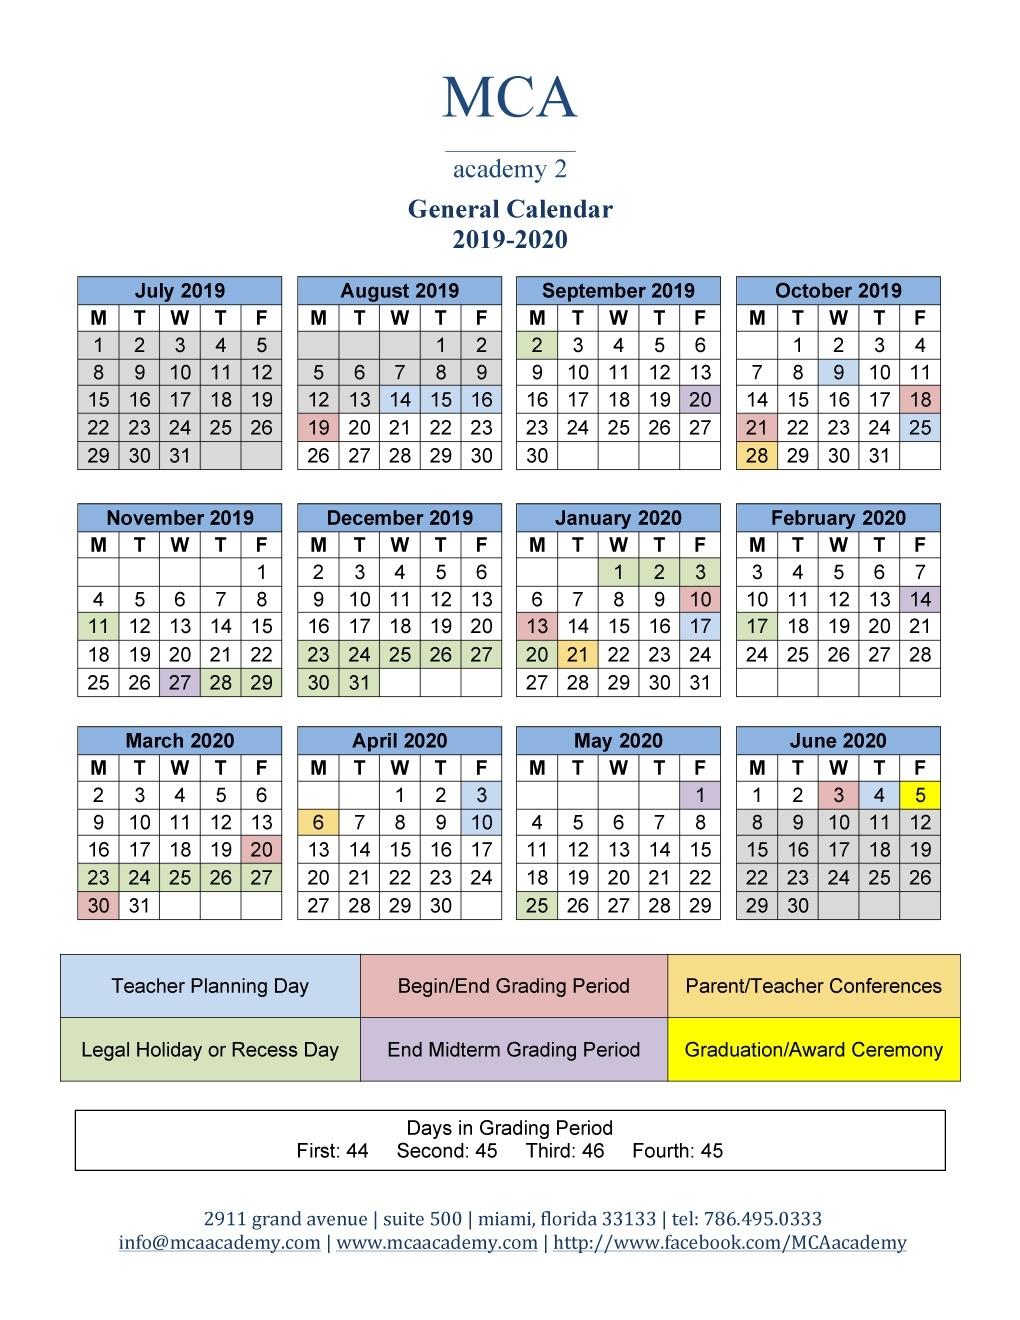 School Calendar 2019-2020 - Mca Academy